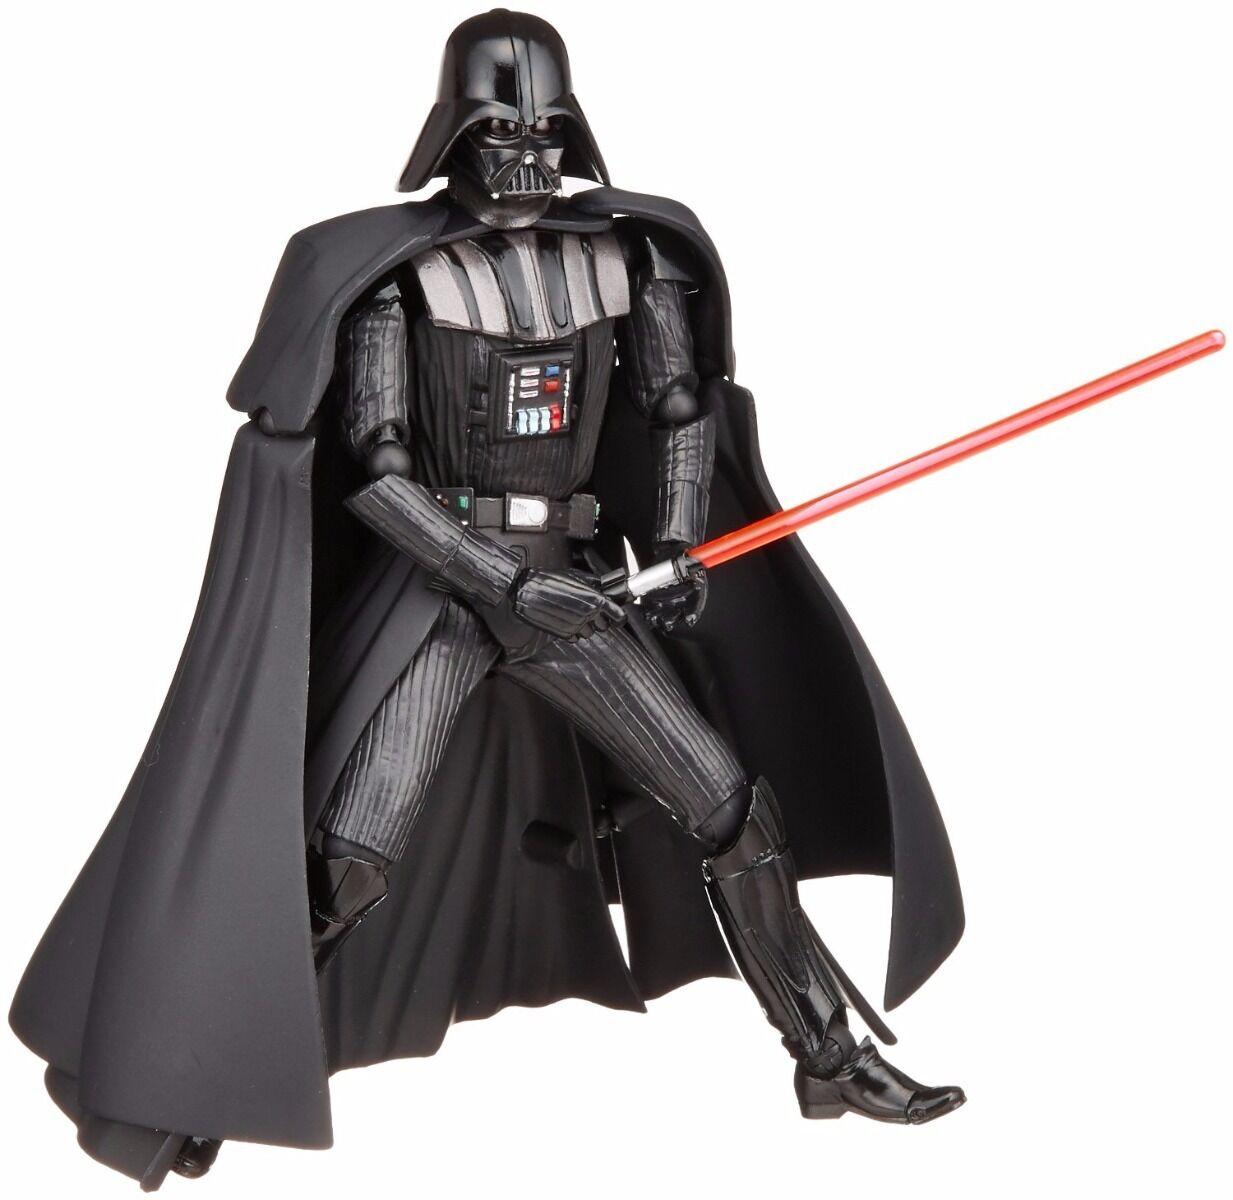 STAR WARS:REVO No.001 Darth Vader Figure KAIYODO NEW from Japan